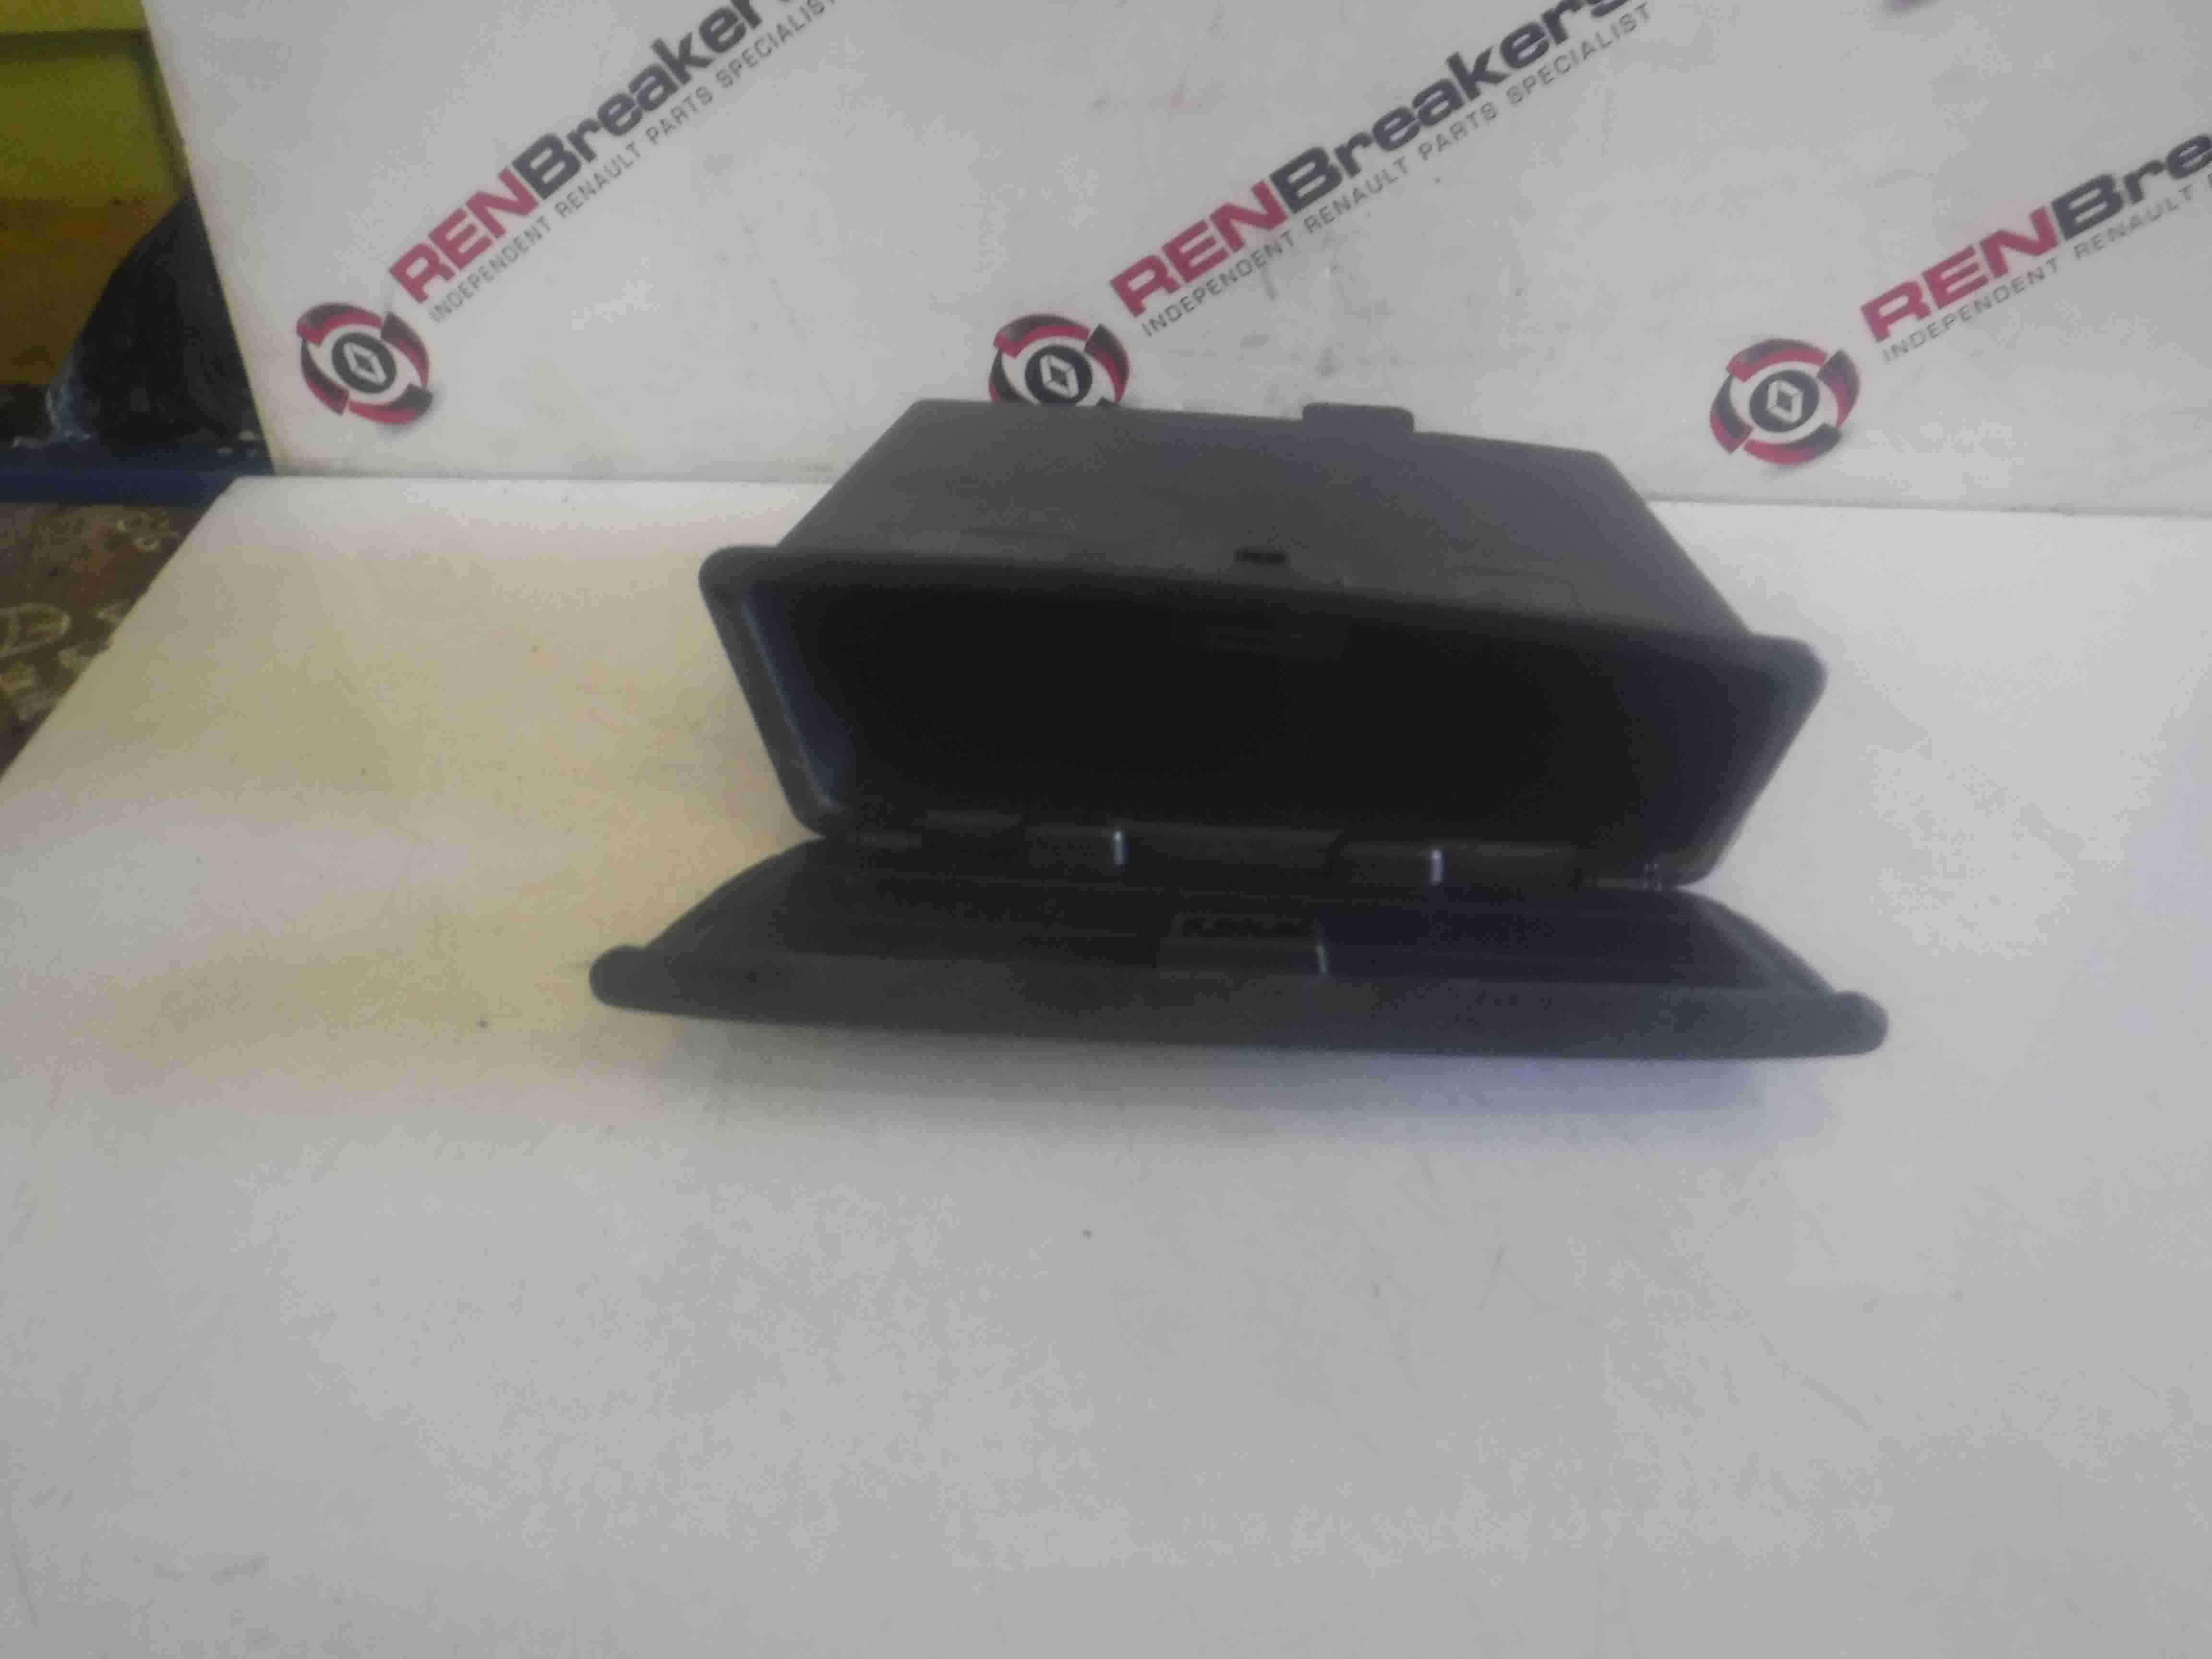 Renault Koleos 2008-2015 Passenger NS Compartment Glove Box Storage